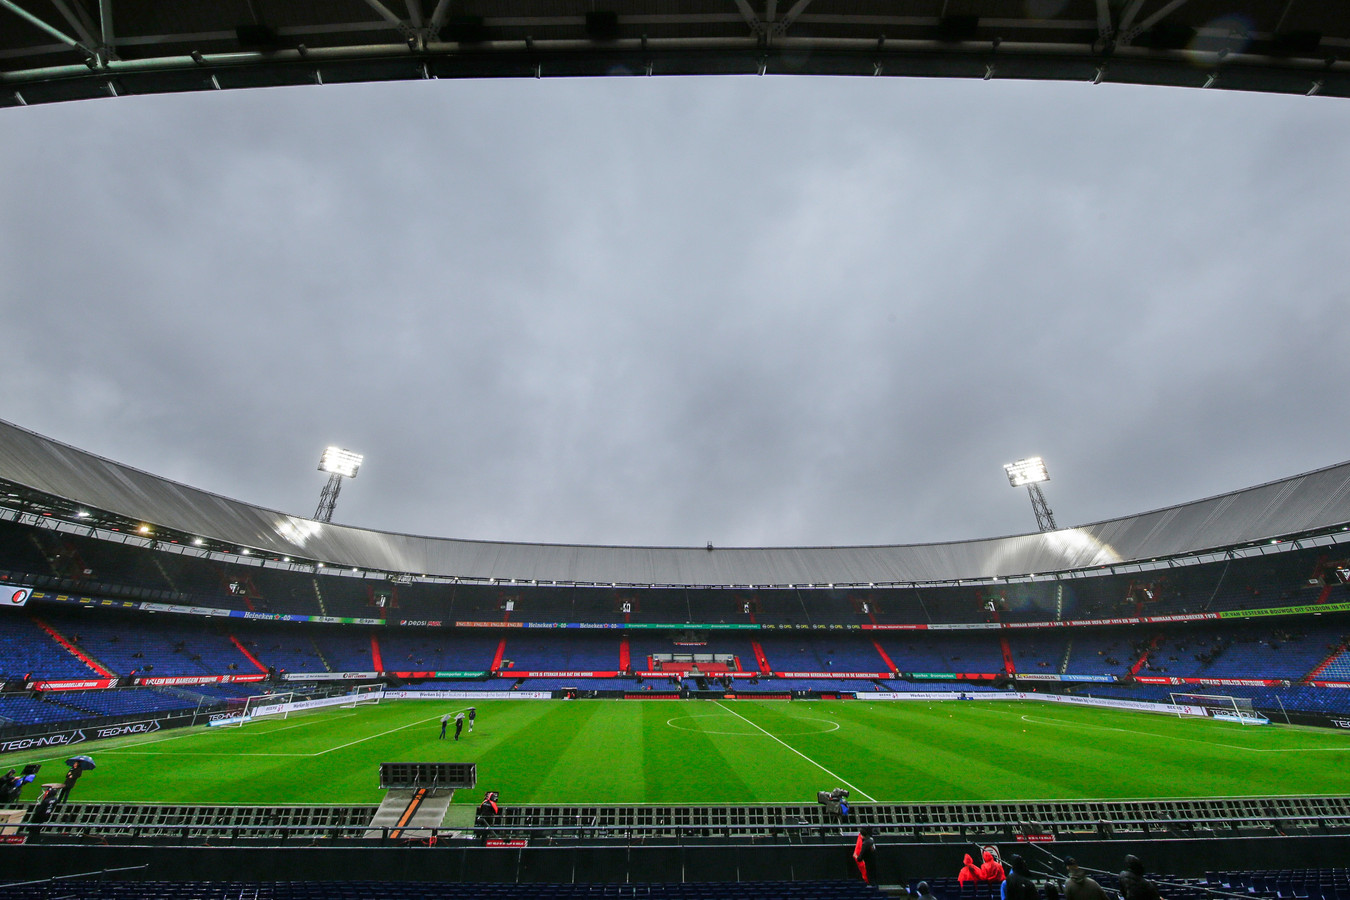 29-09-2019 Stadion Feyenoord De Kuip.